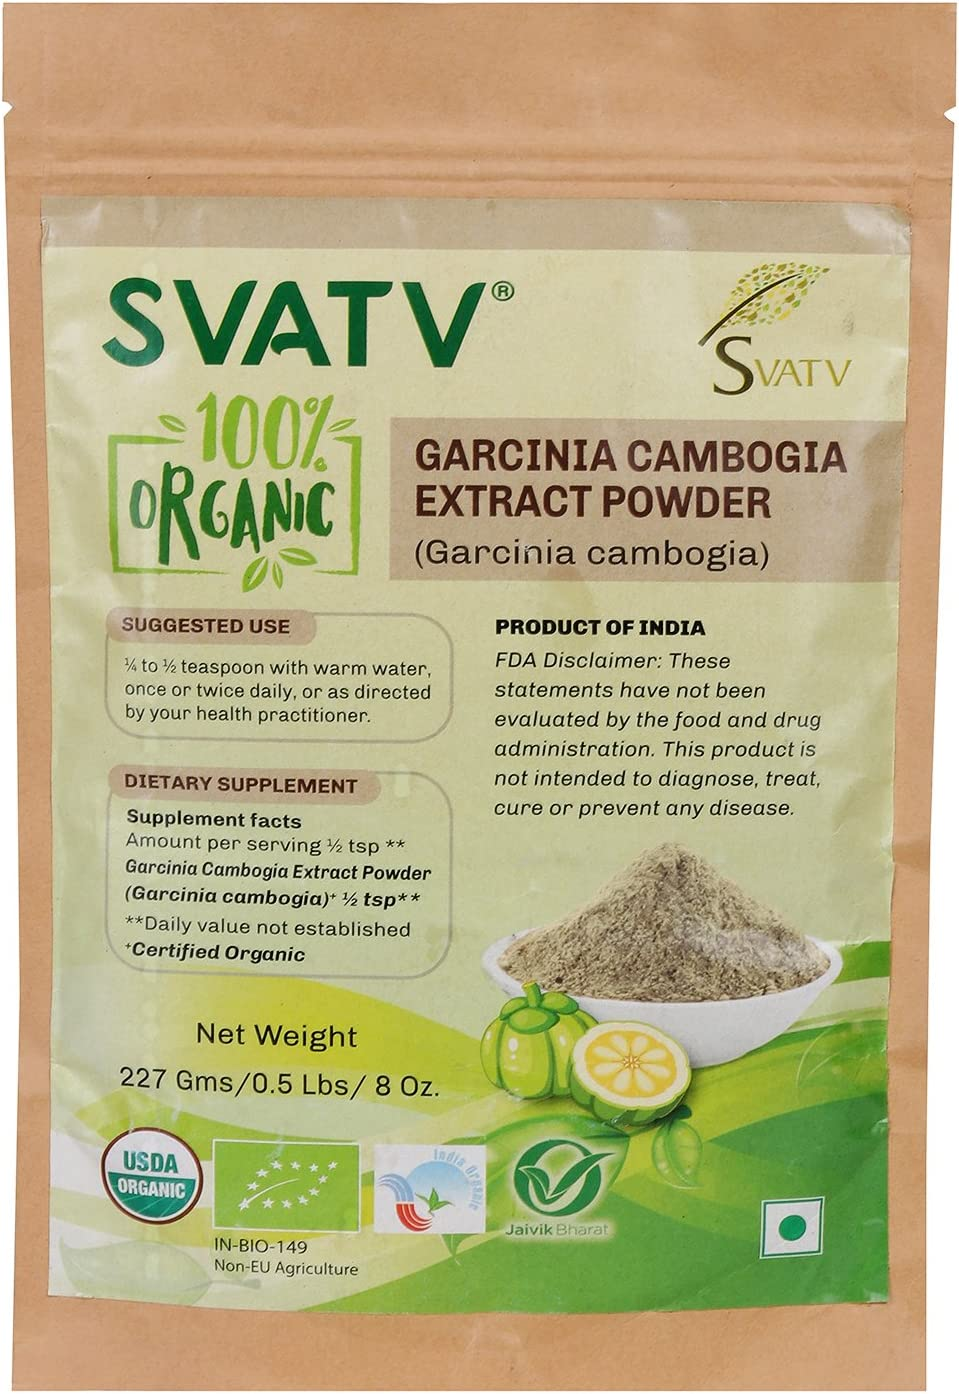 Amazon.com: SVATV Organic Garcinia cambogia 1/2 LB, 08 oz, 227g USDA  Certified Organic- Biodegradable Resealable Zip Lock Pouch: Health &  Personal Care